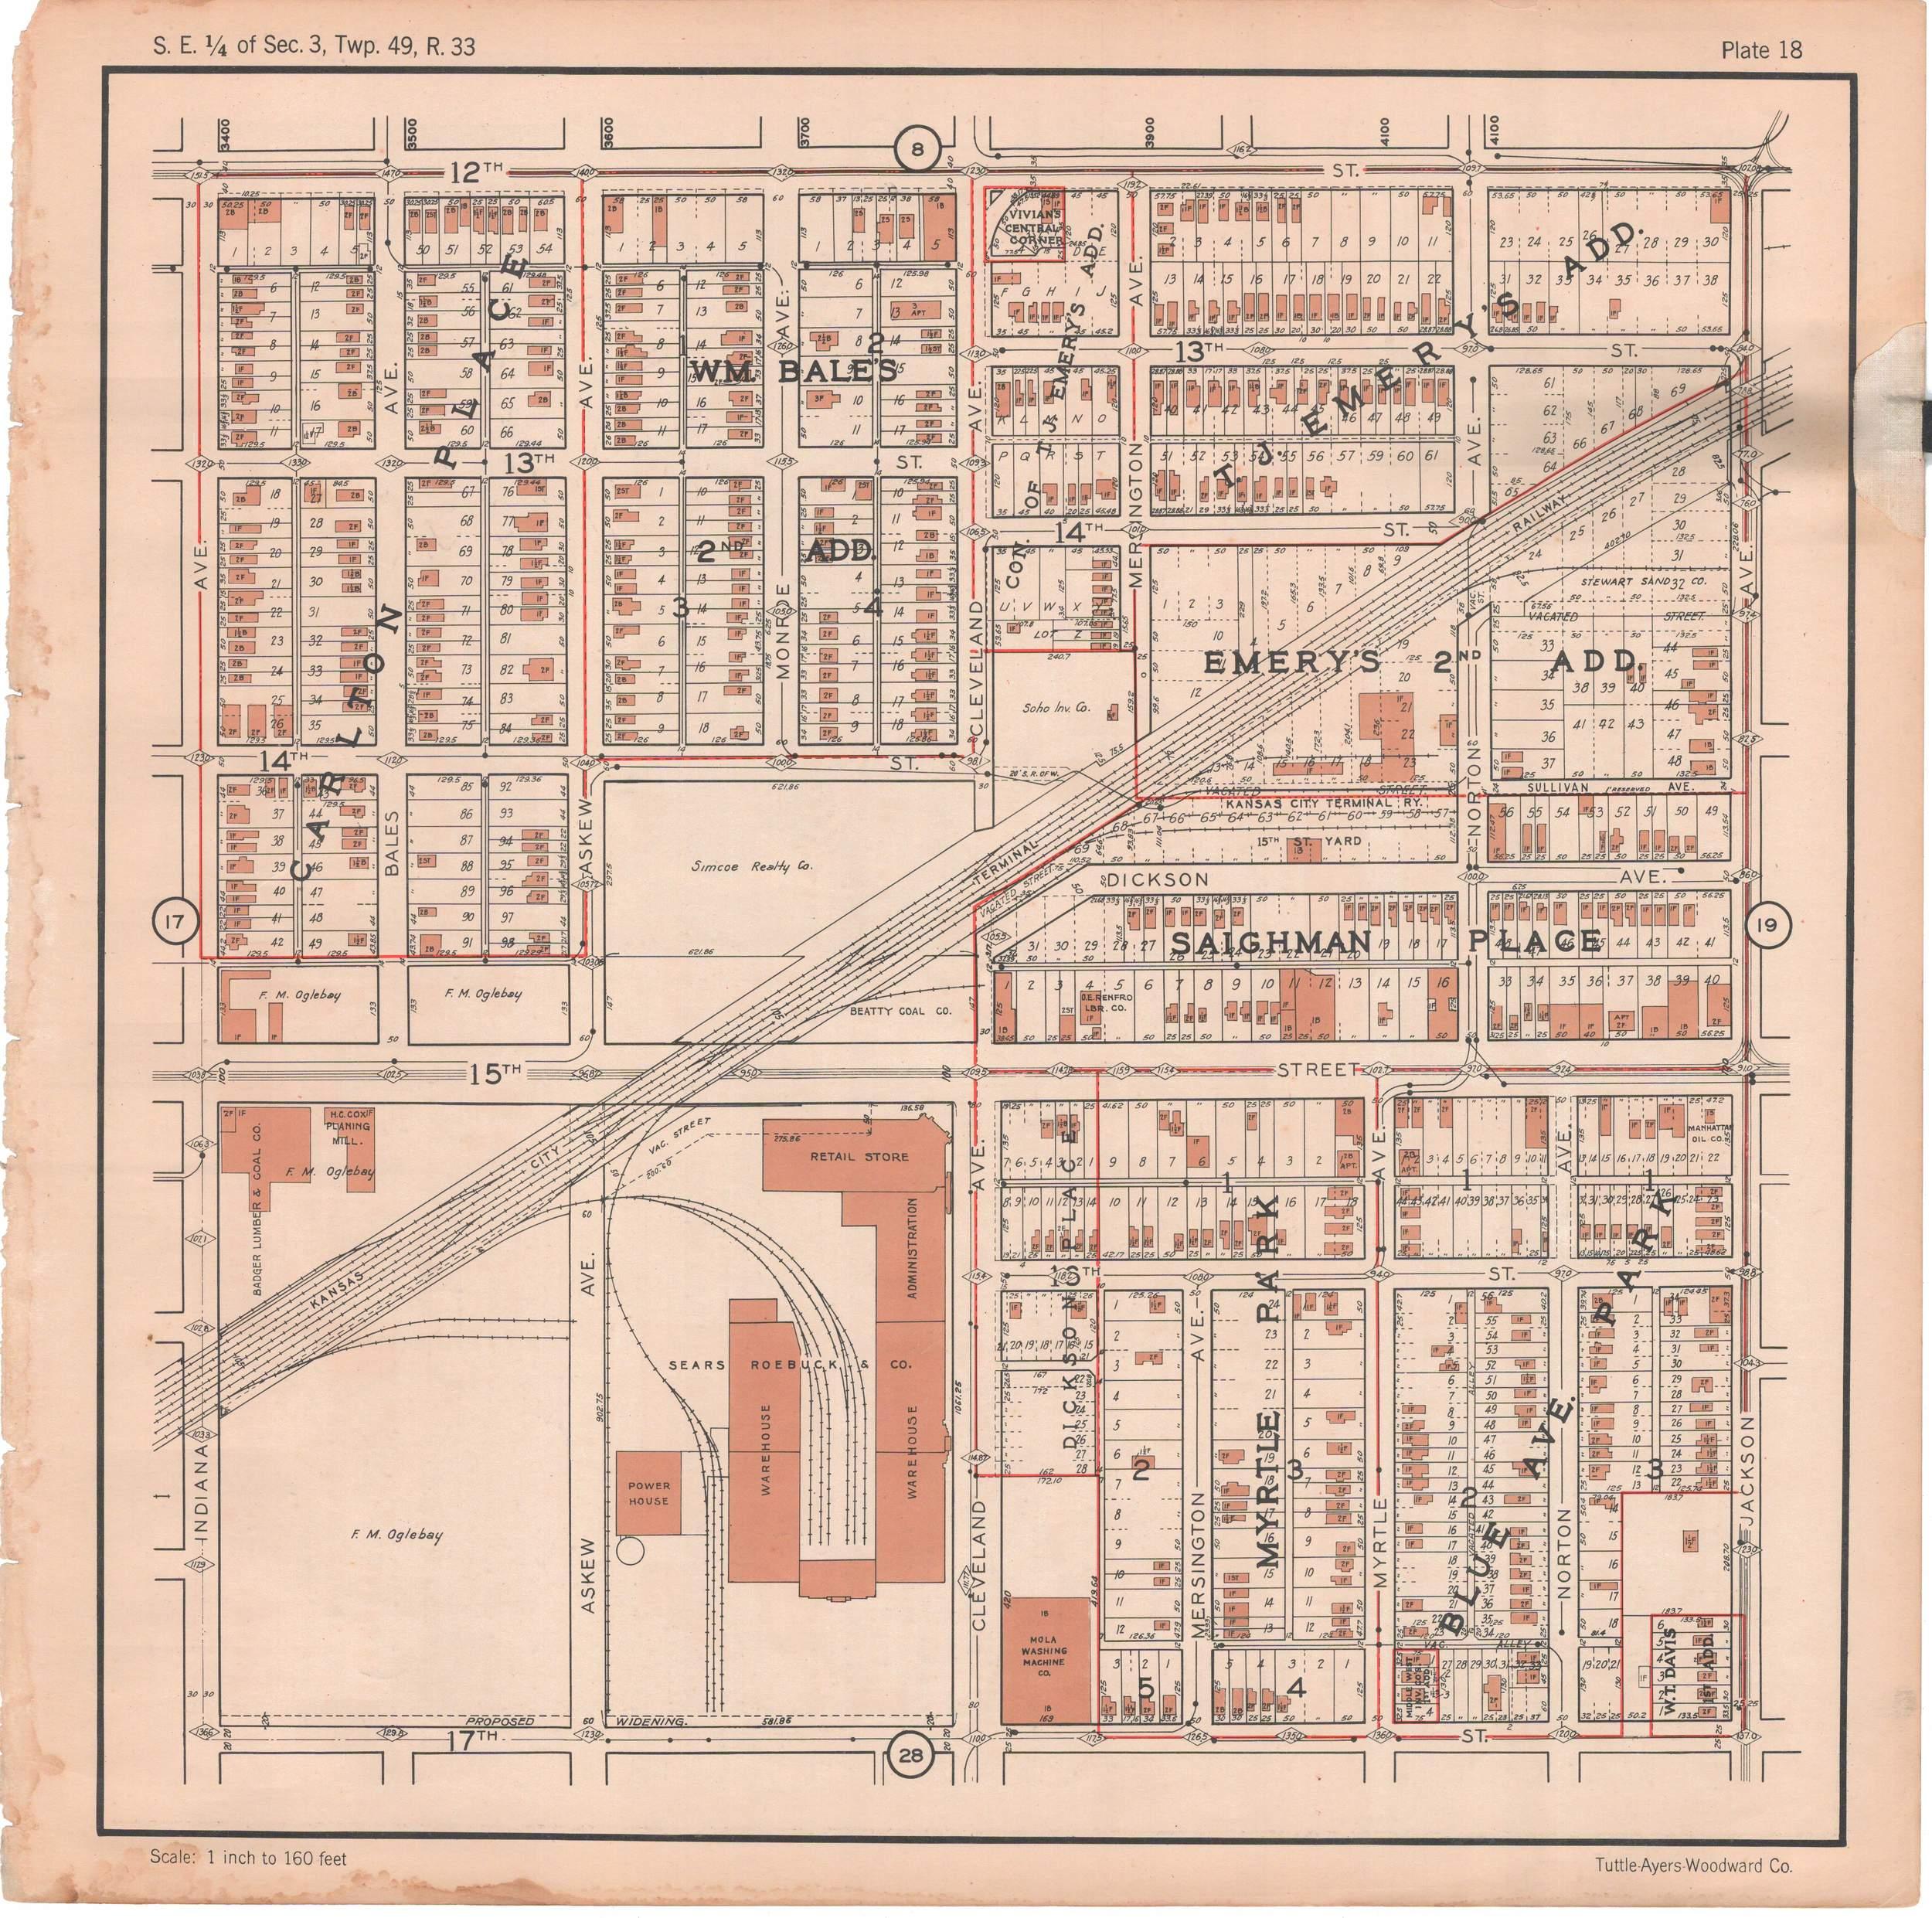 1925 TUTTLE_AYERS_Plate 18.JPG